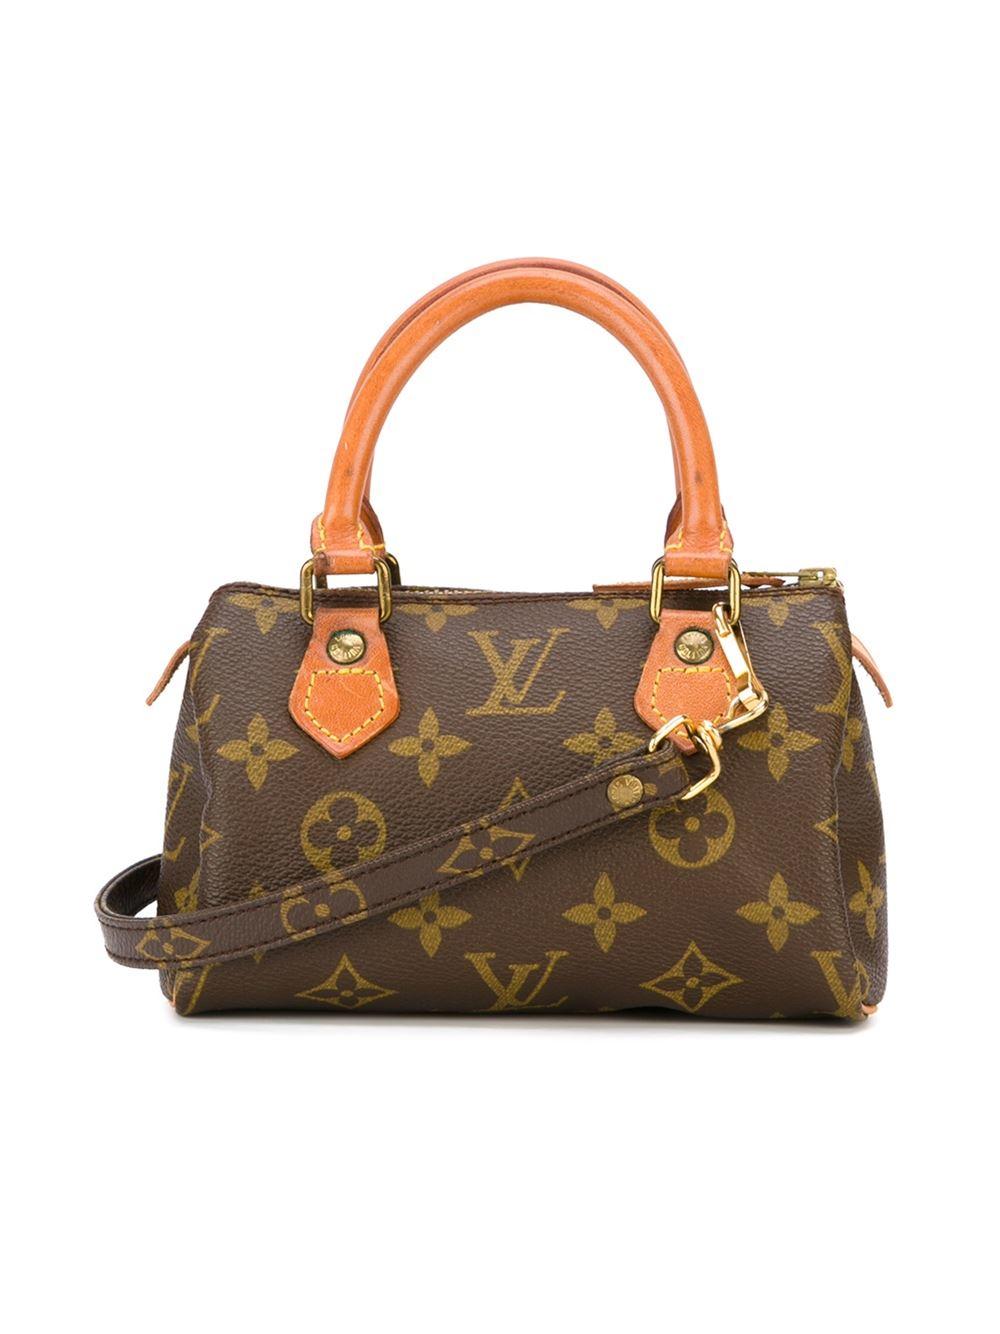 New Louis Vuitton Pochette Bosphore Crossbody Bag  Handbags  LOU26992